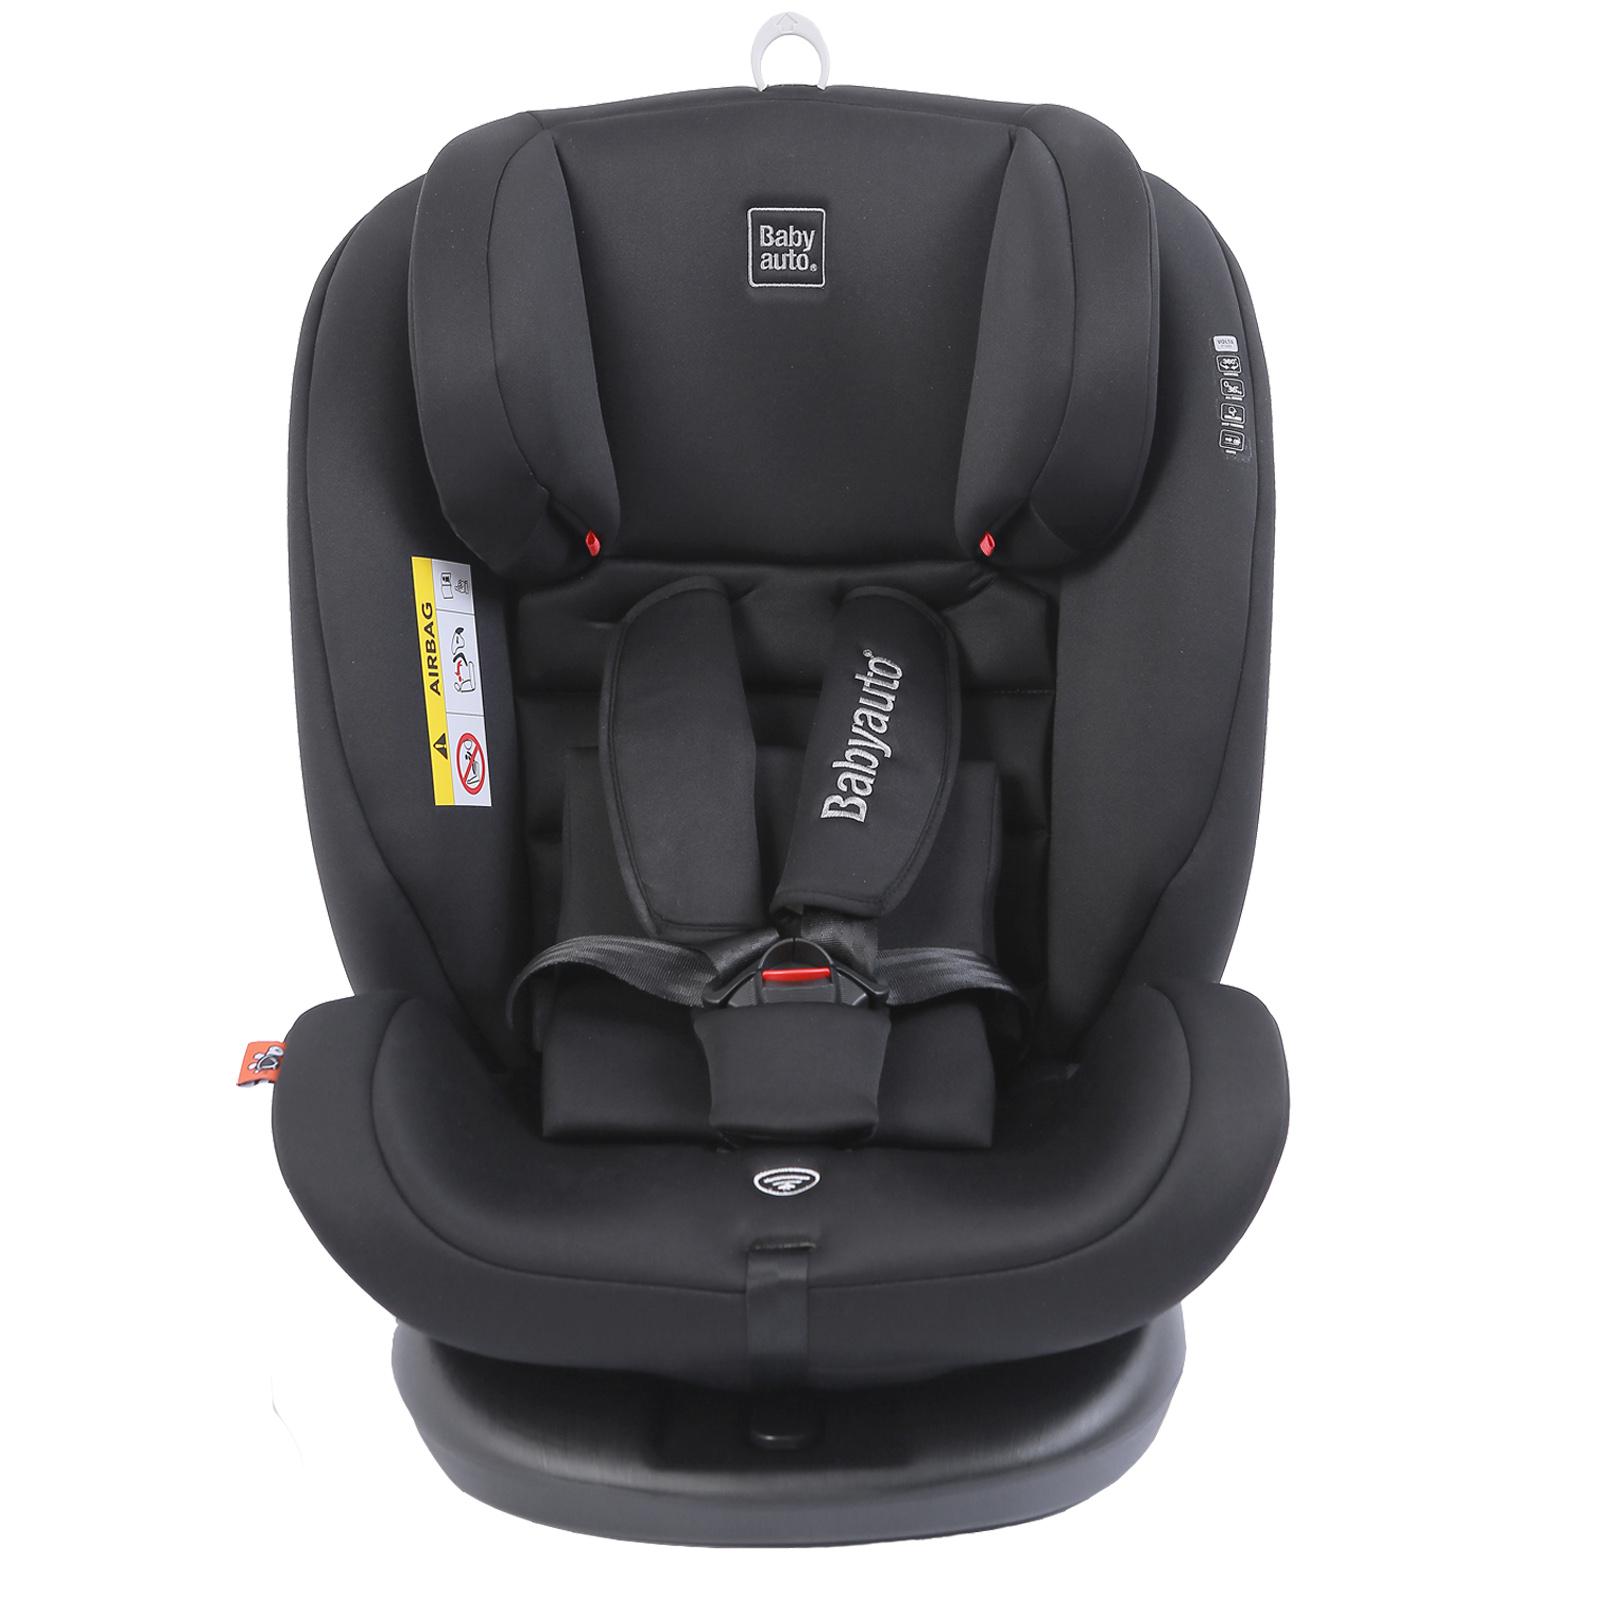 Babyauto Volta Spin 360 Group 0+1/2/3 ISOFIX Car Seat ...